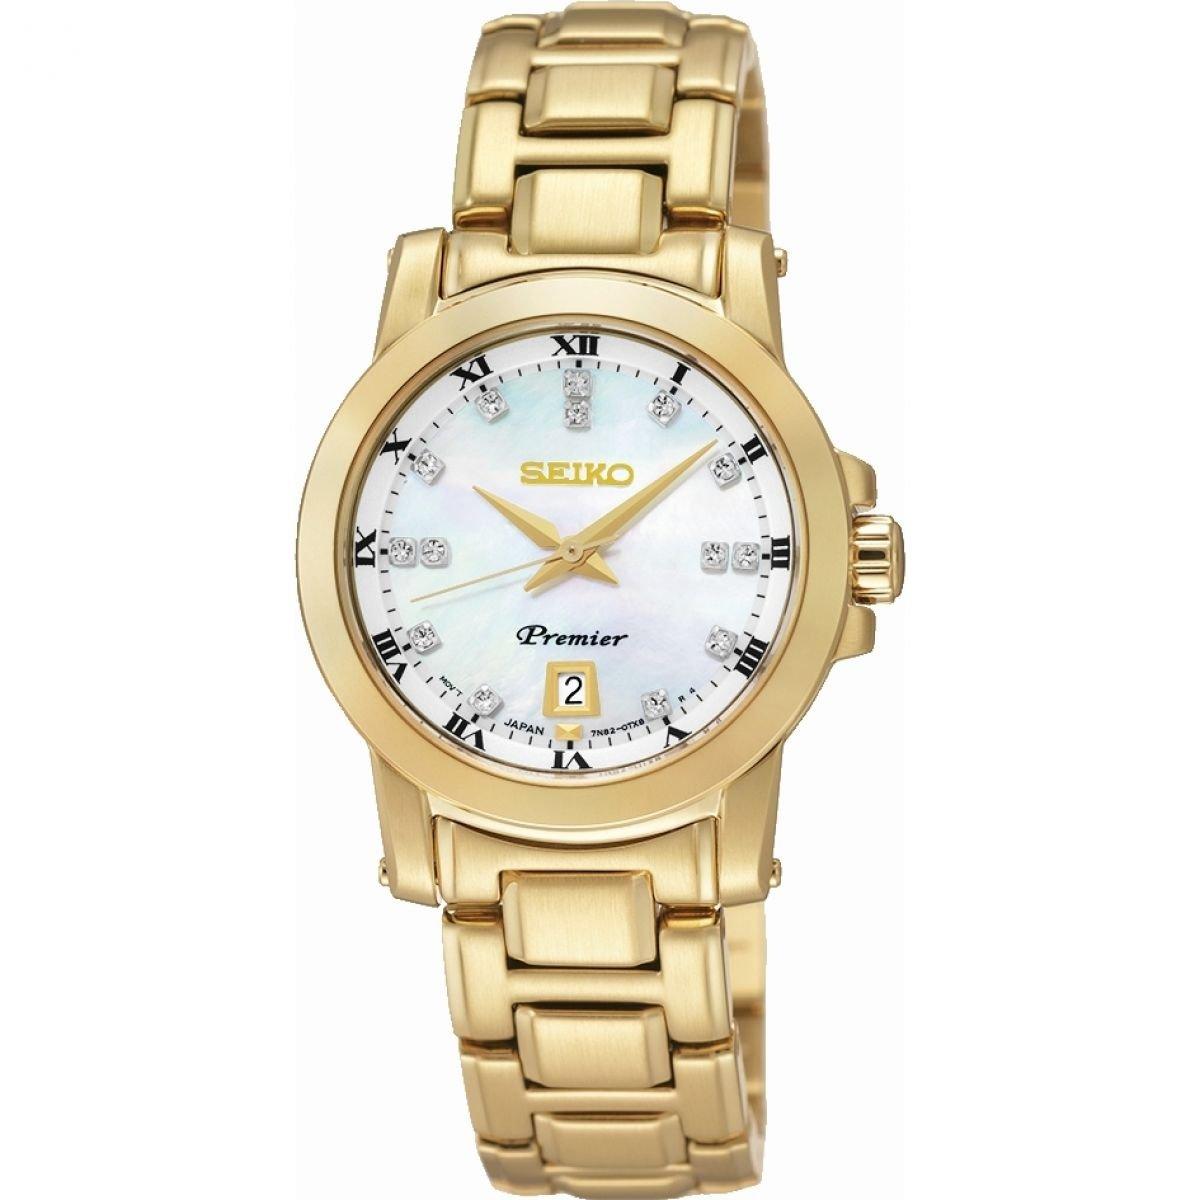 Seiko Reloj Analógico para Mujer de Cuarzo con Correa en Acero Inoxidable SXDG04P1: Seiko: Amazon.es: Relojes